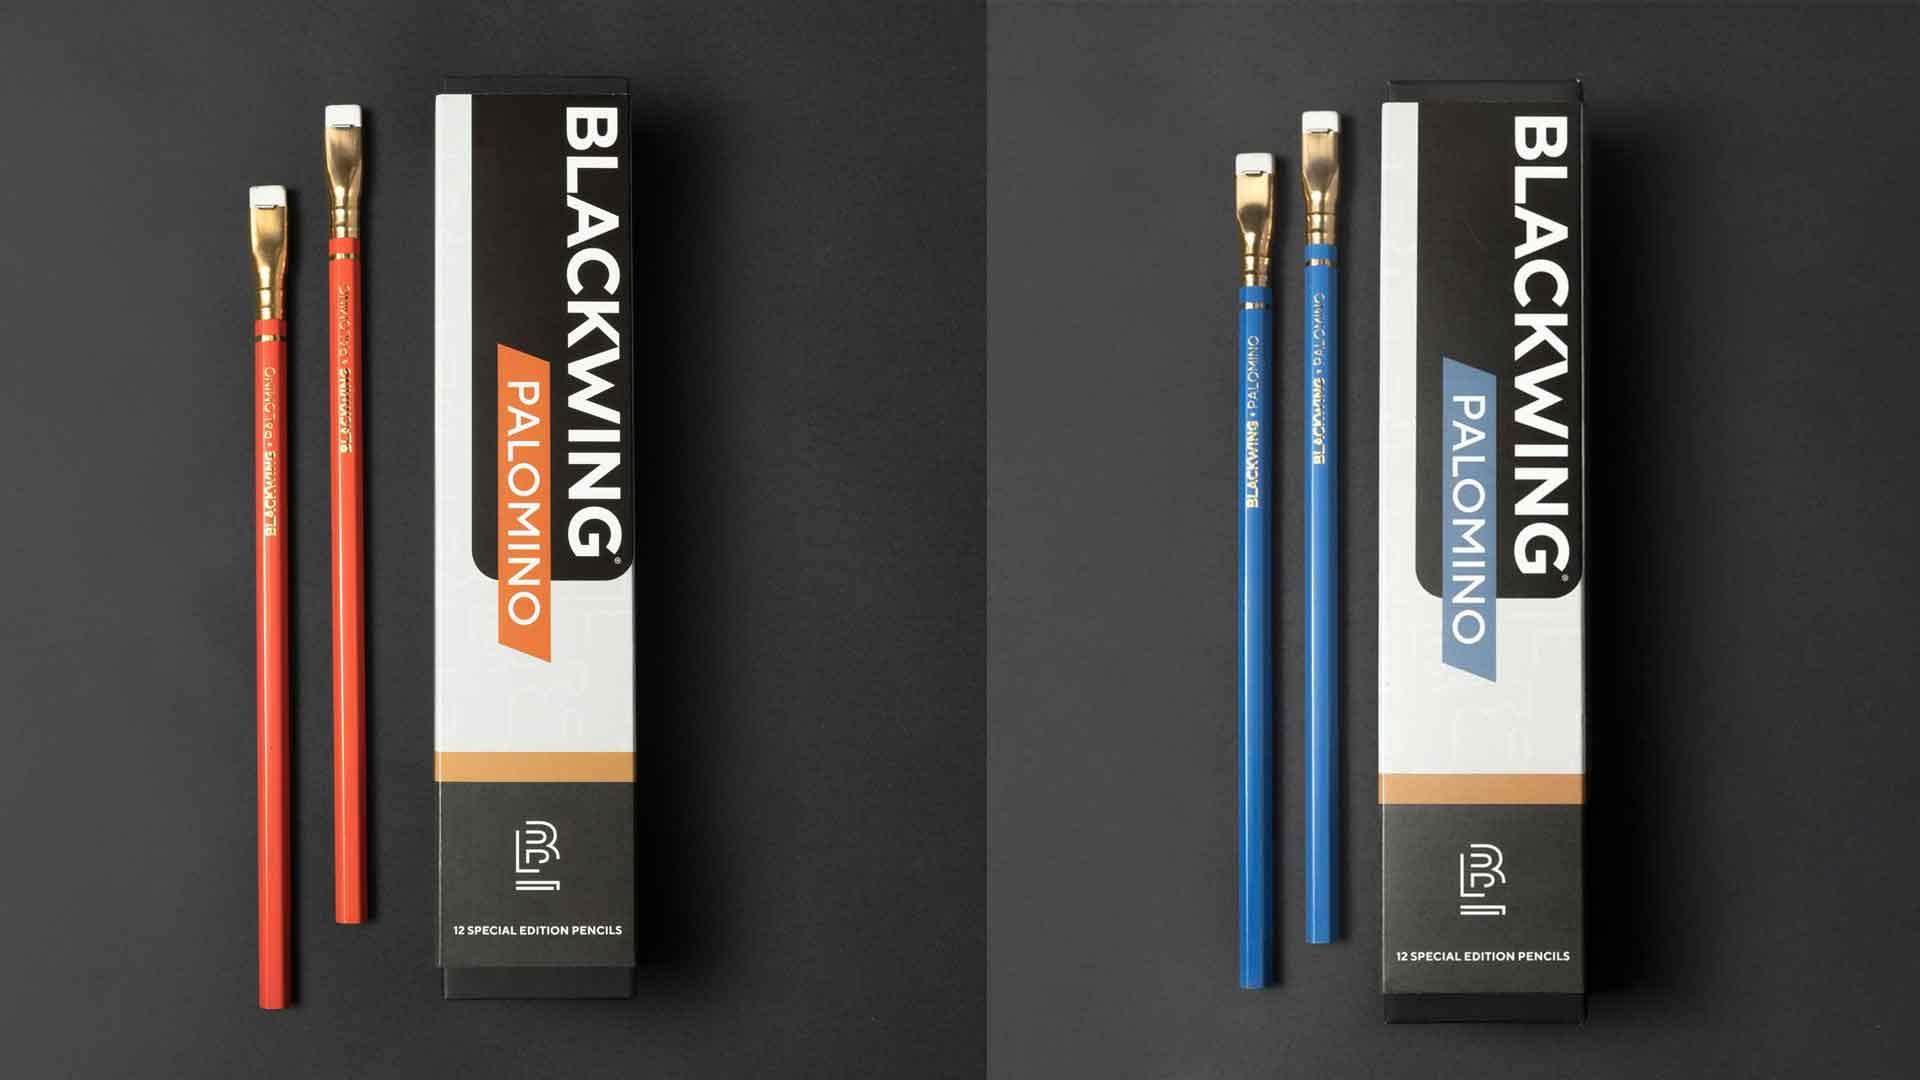 Blackwing Lápices Palomino